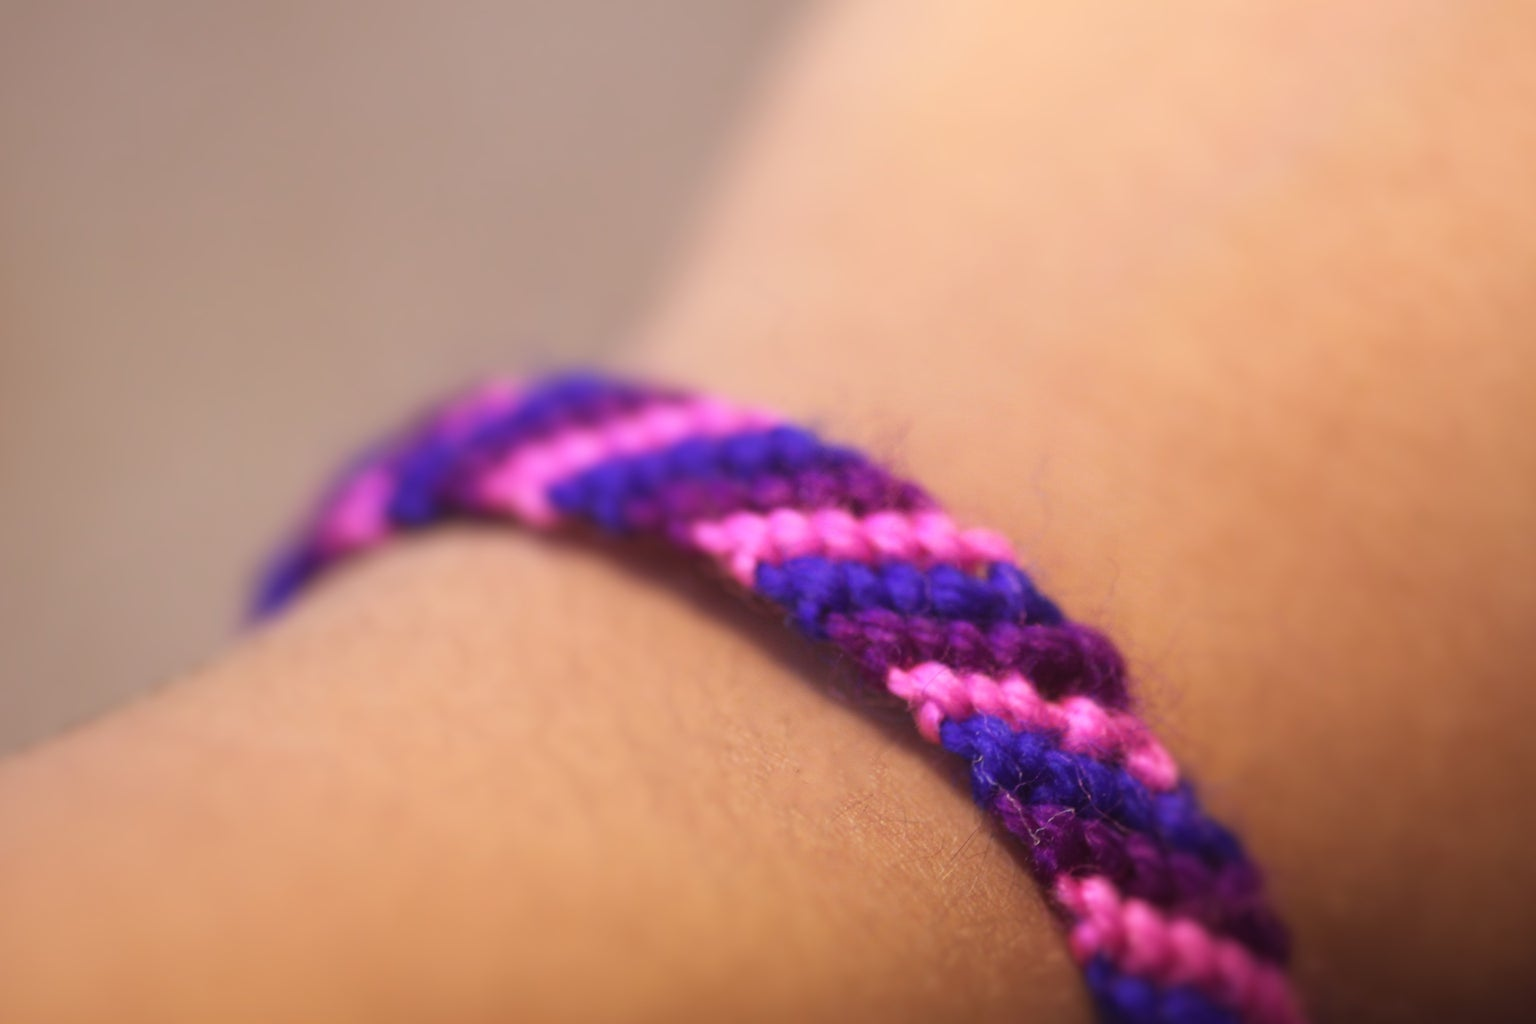 How to Make Bracelets Using Yarn